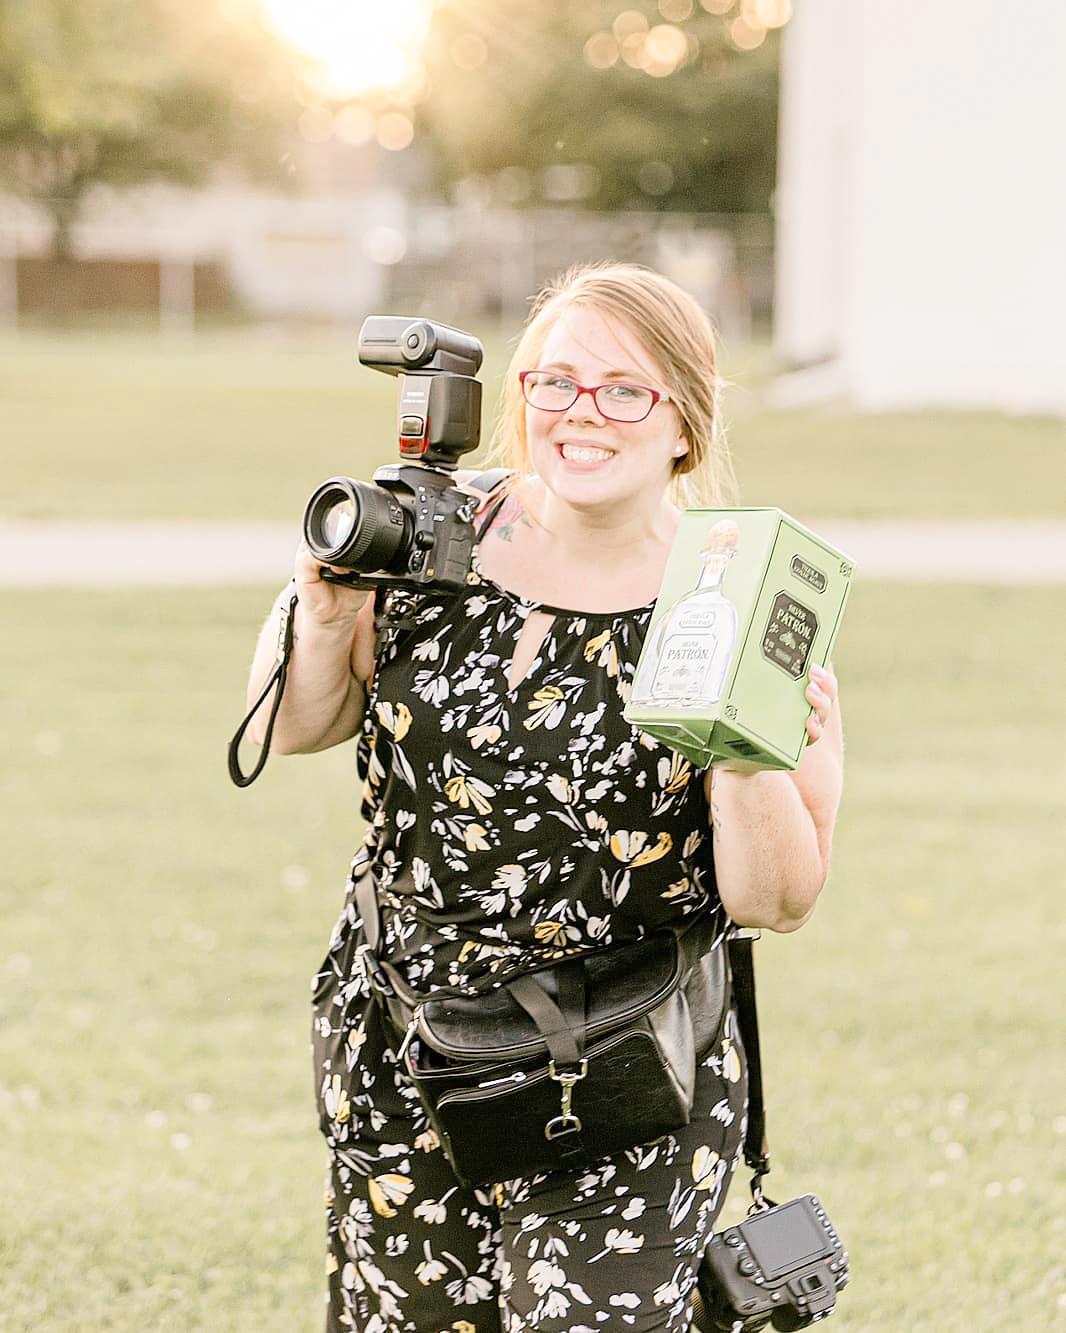 LINDSAY-ADKINS-PHOTOGRAPHY-MICHIGAN-WEDDING-PHOTOGRAPHER-MICHIGAN-WEDDING-PHOTOGRAPHY